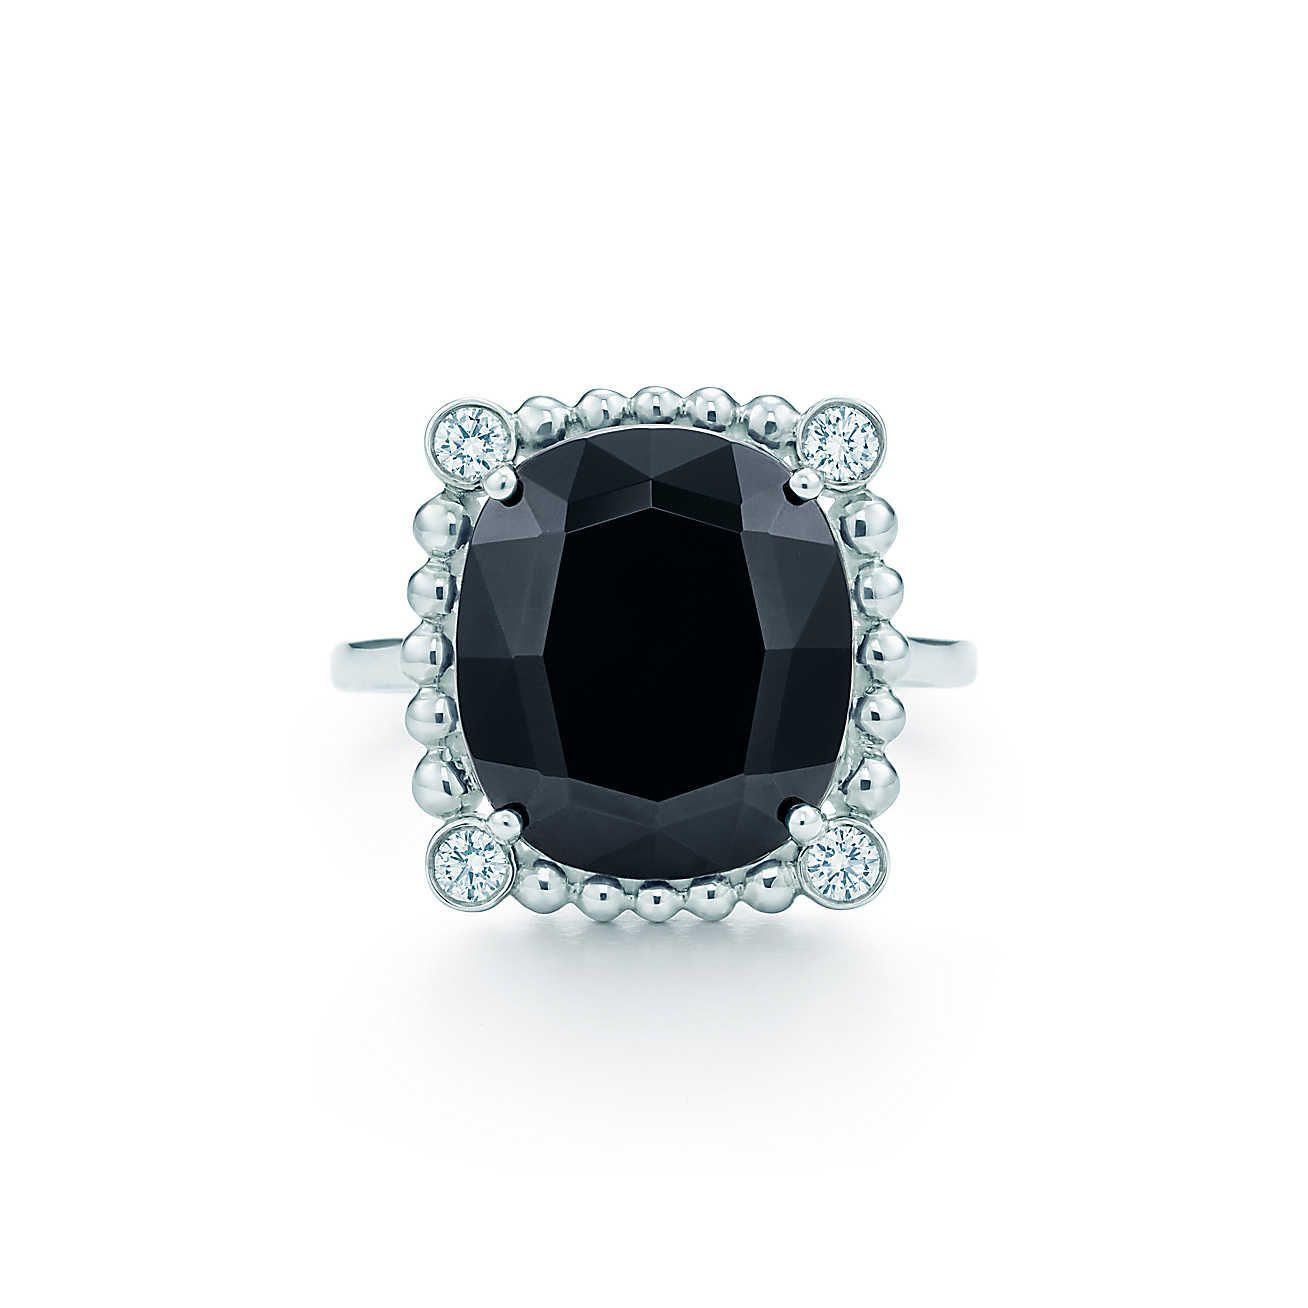 4b1302c38 Ziegfeld Collection:Black Spinel Ring in 2019   Wedding Dreams ...